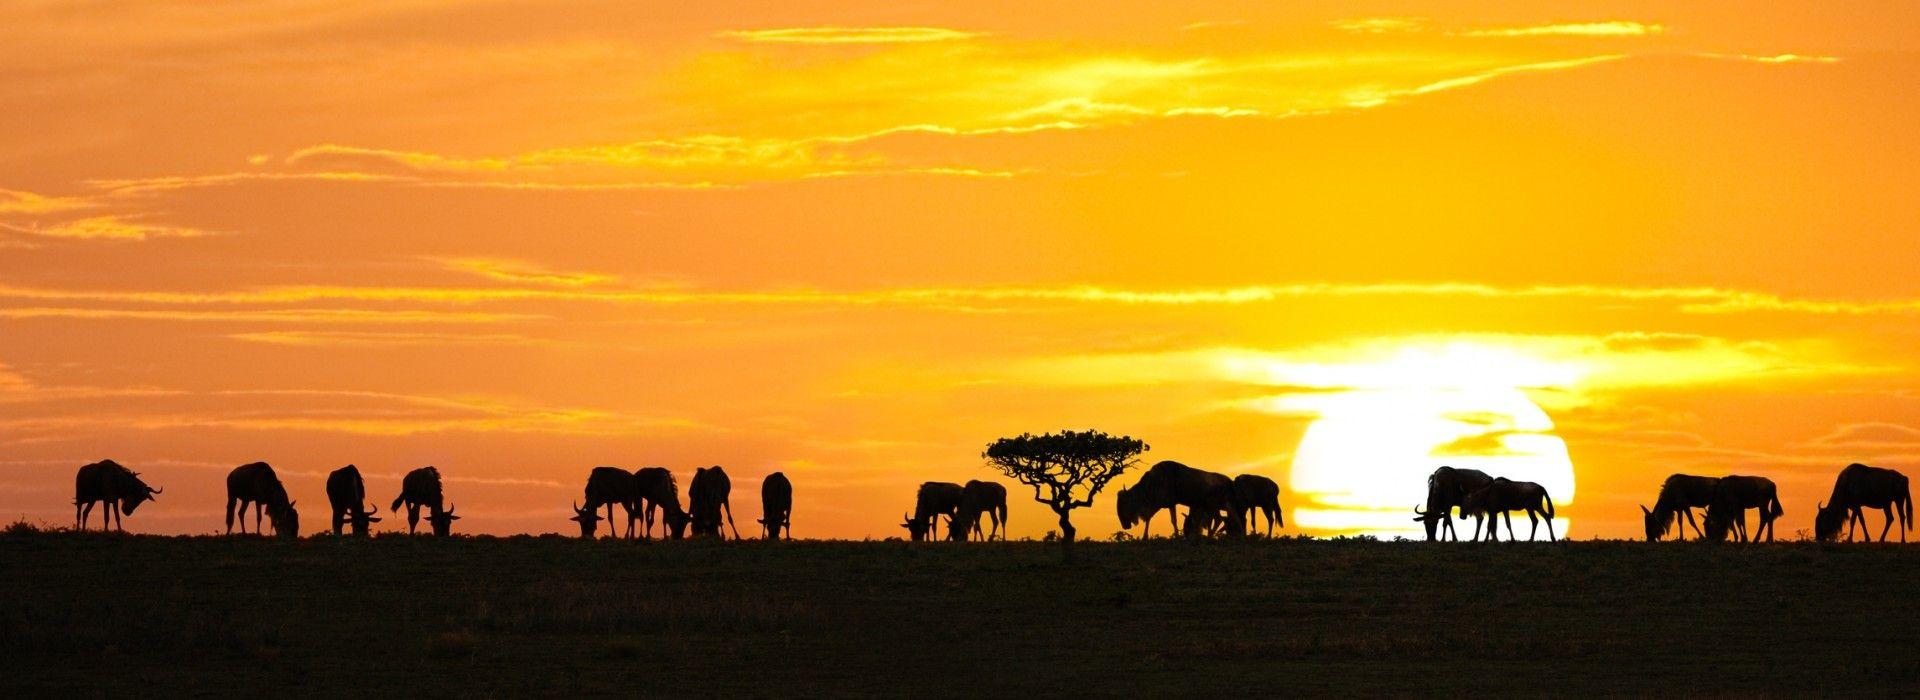 Adventure and sport Tours in Tanzania Safari Parks